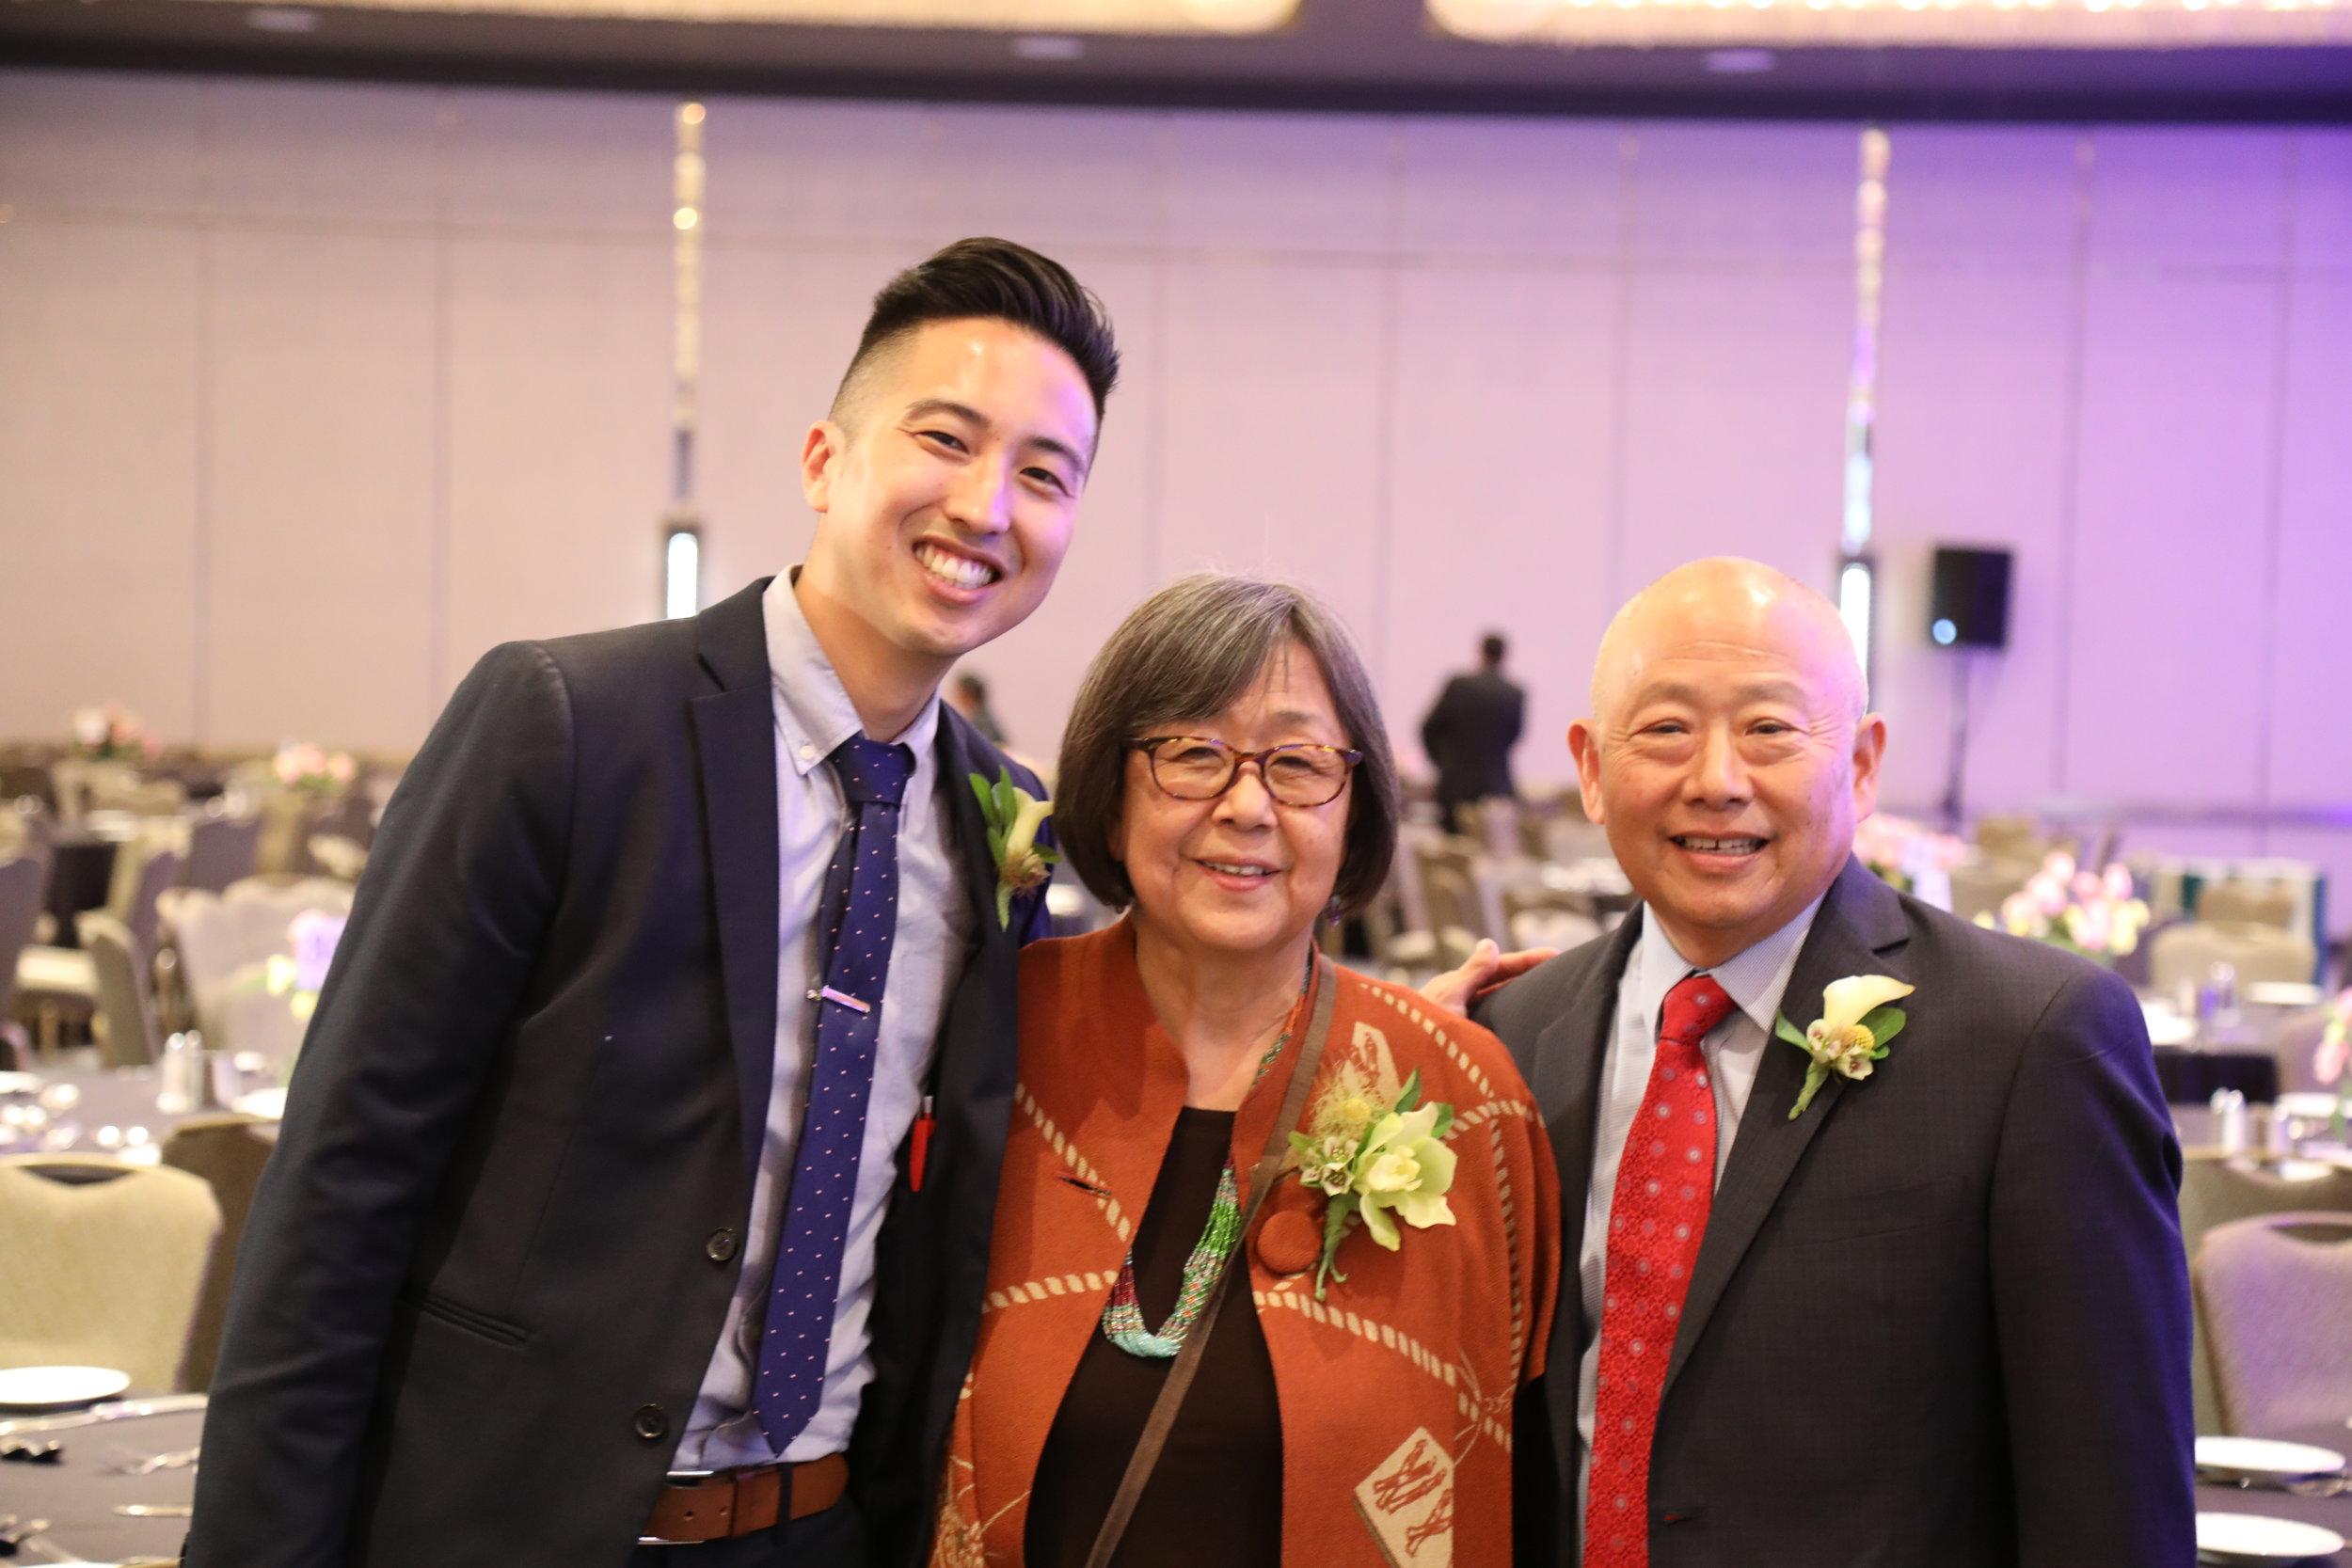 2018 Community Spirit Award recipients Craig Ishii, Kathy Masaoka, and Alan Miyatake.